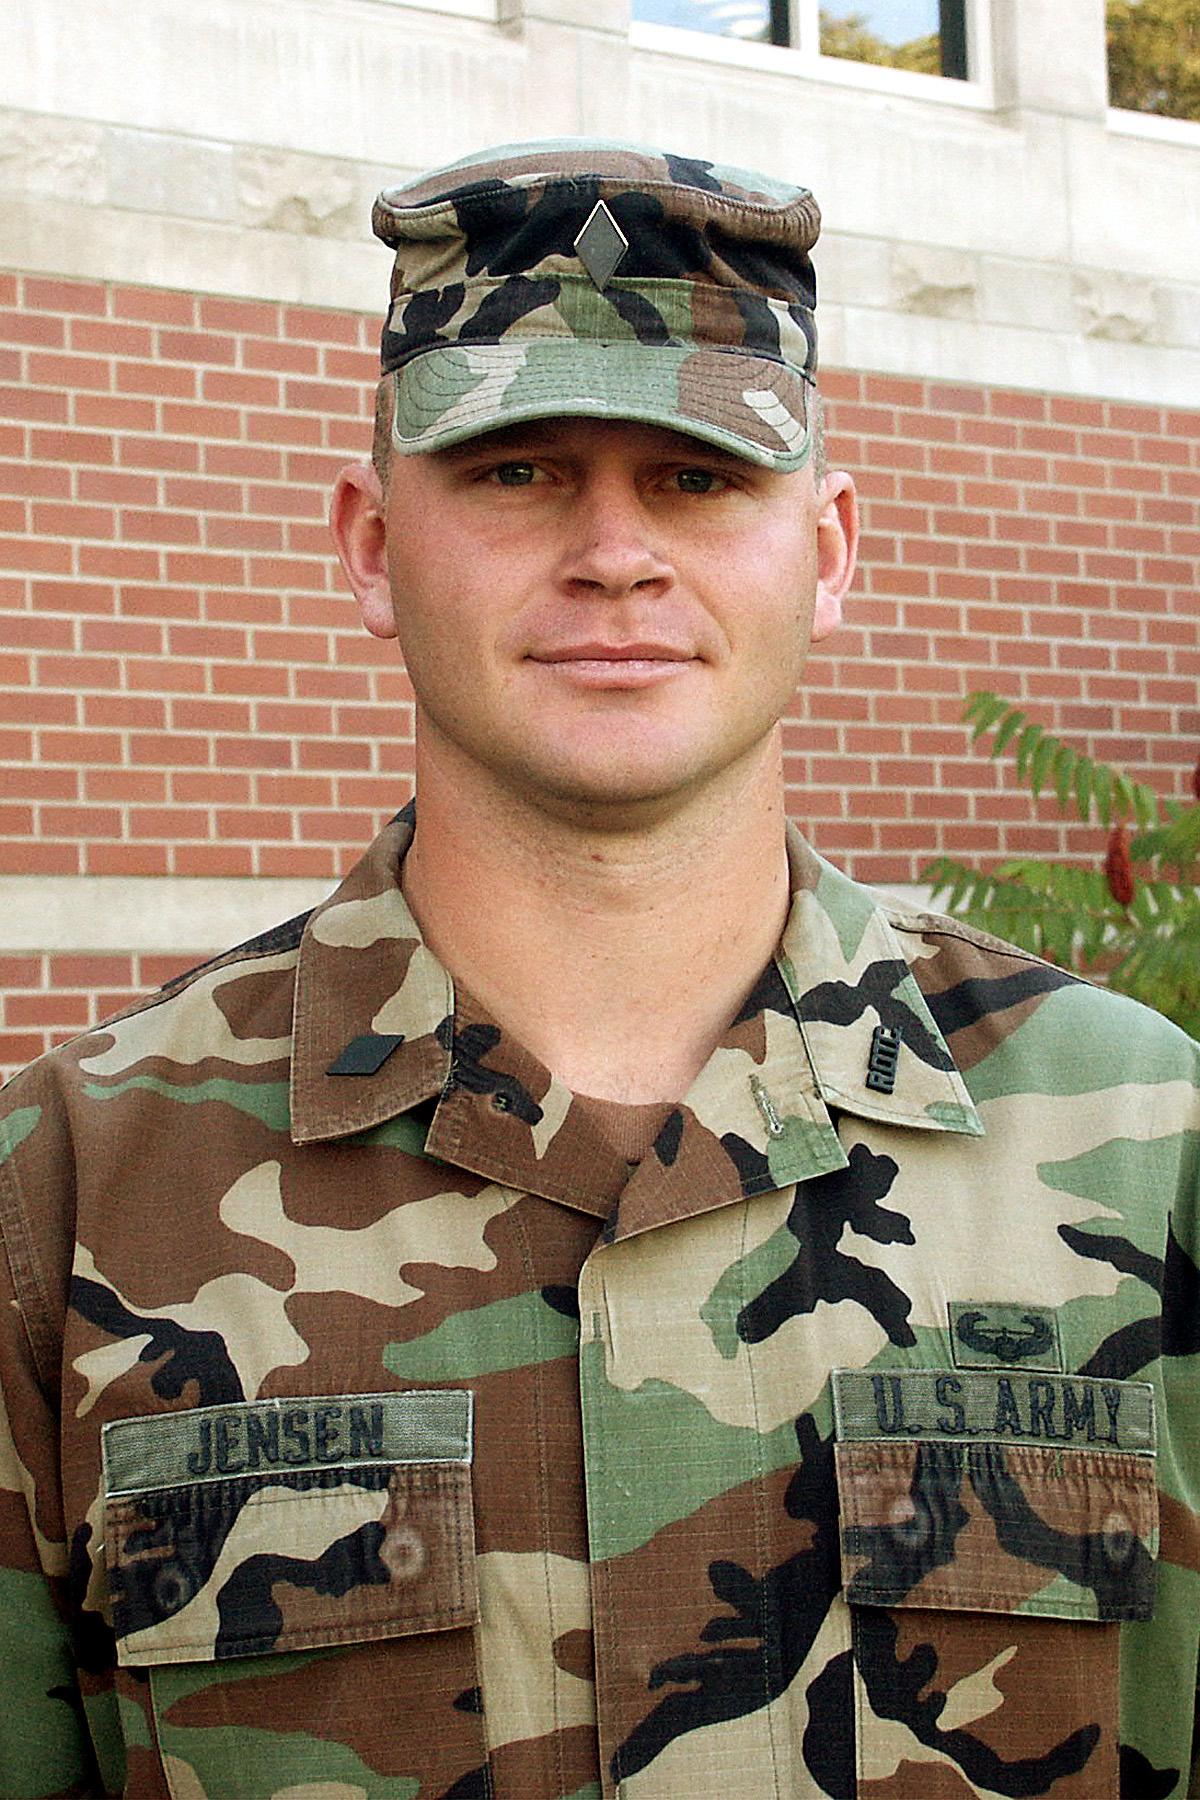 U of U ROTC Cadet Leonard Jensen to receive Scholarship in Washington, D.C.